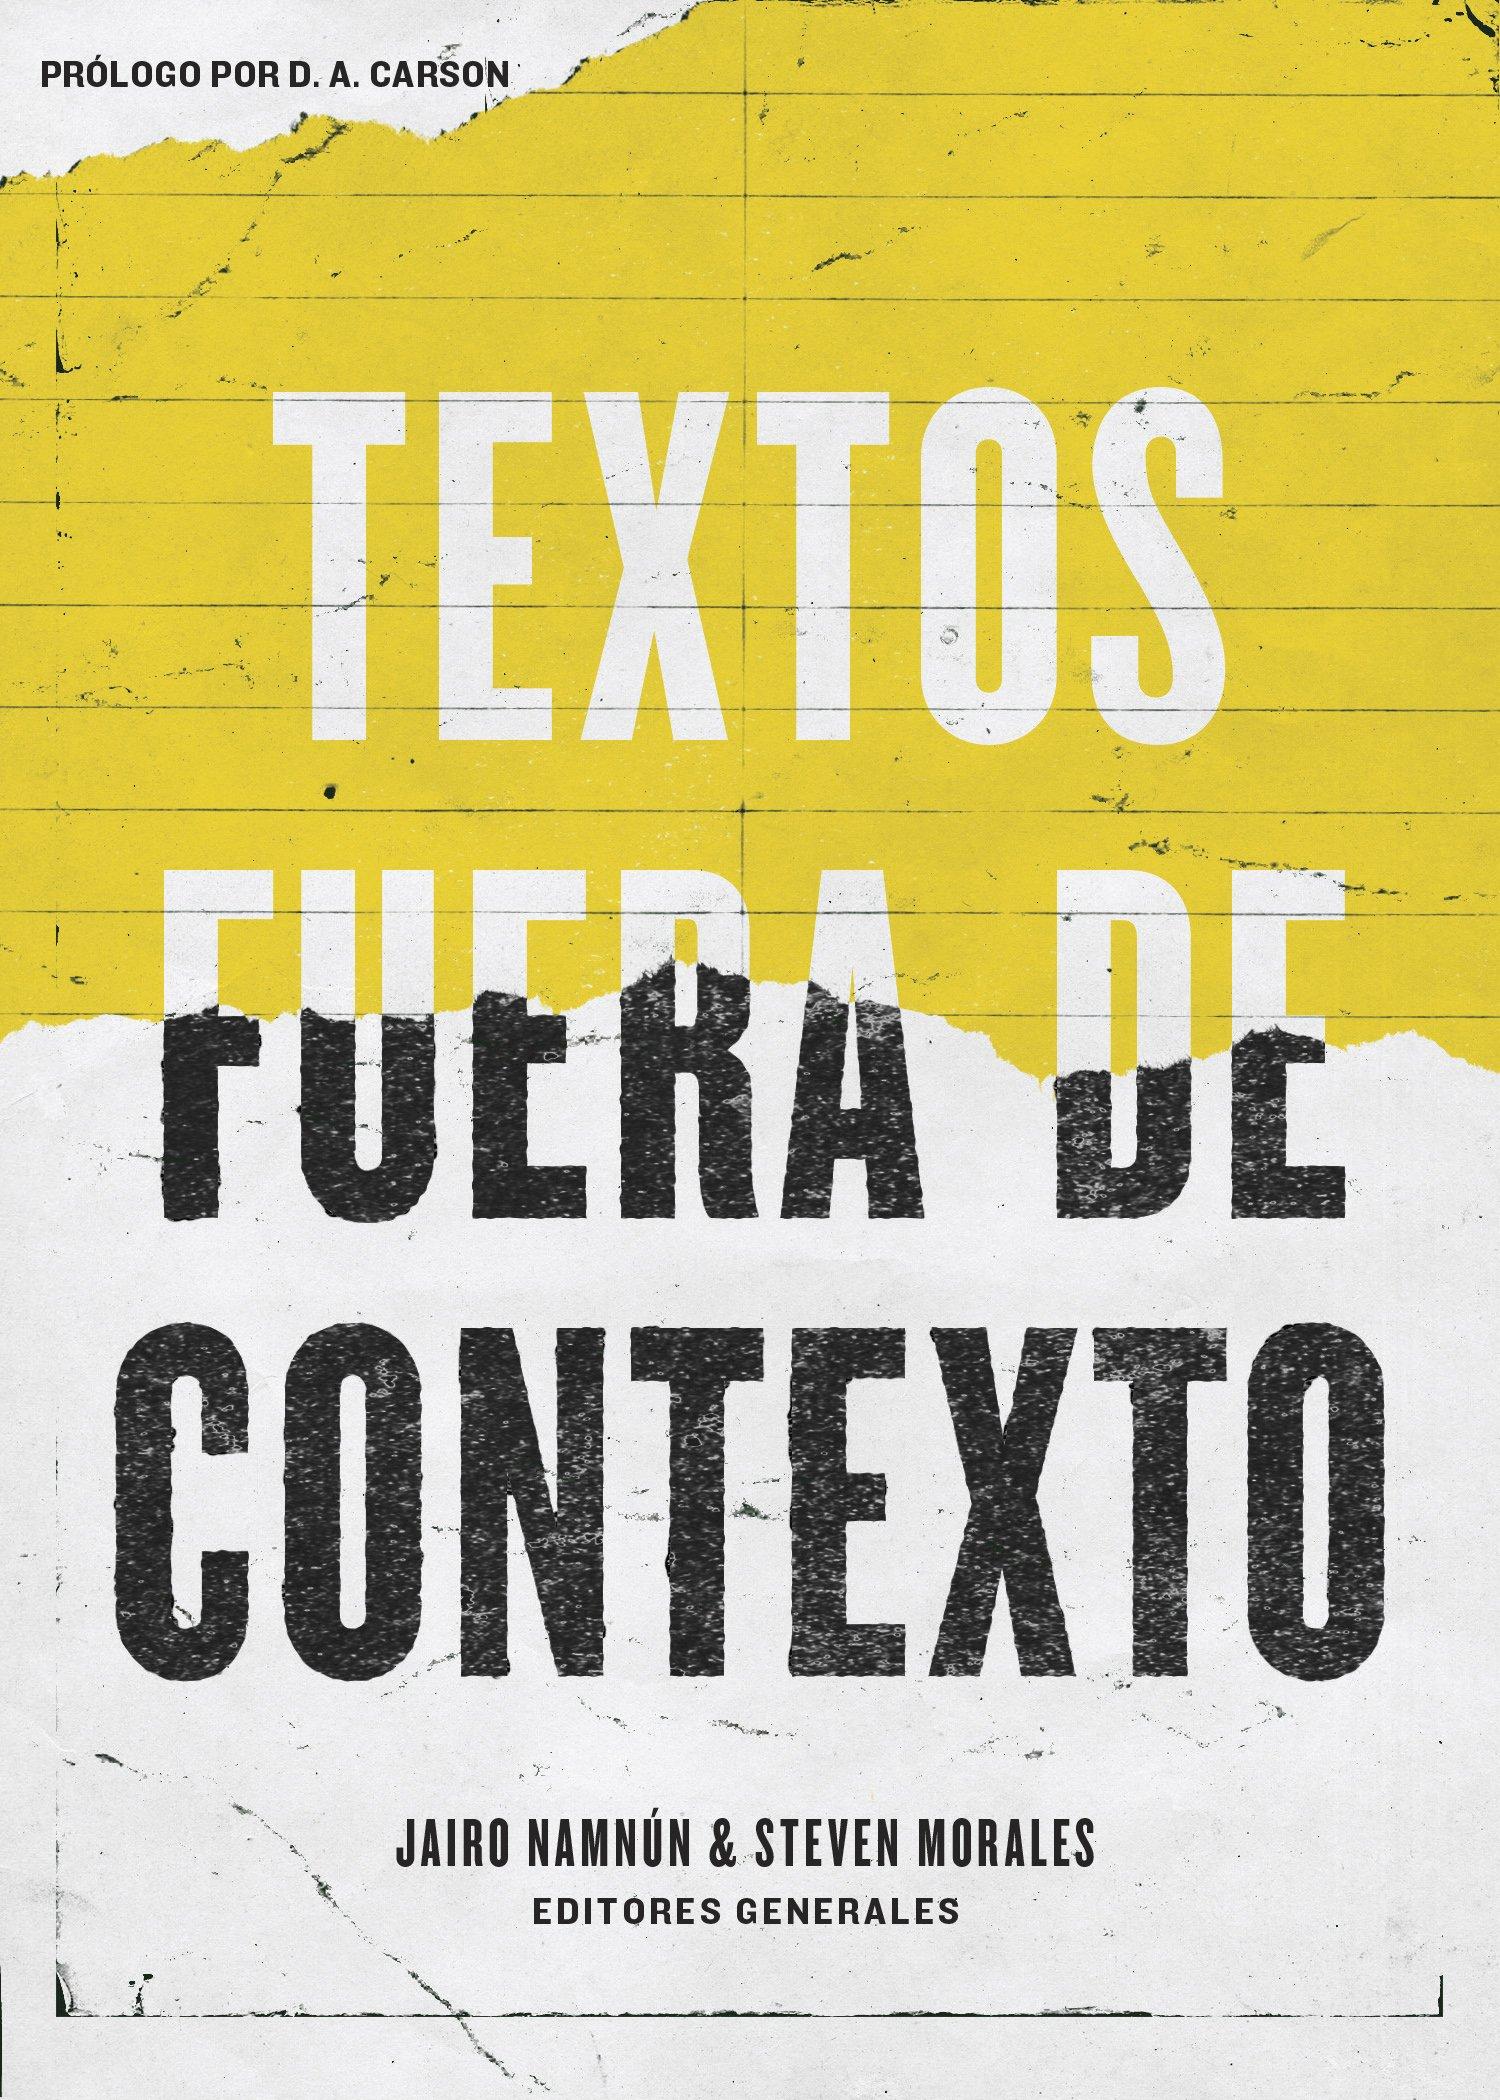 Textos Fuera de Contexto: Amazon.es: Coalicion Por El Evangelio, Jairo E. Namnun, Steven Morales: Libros